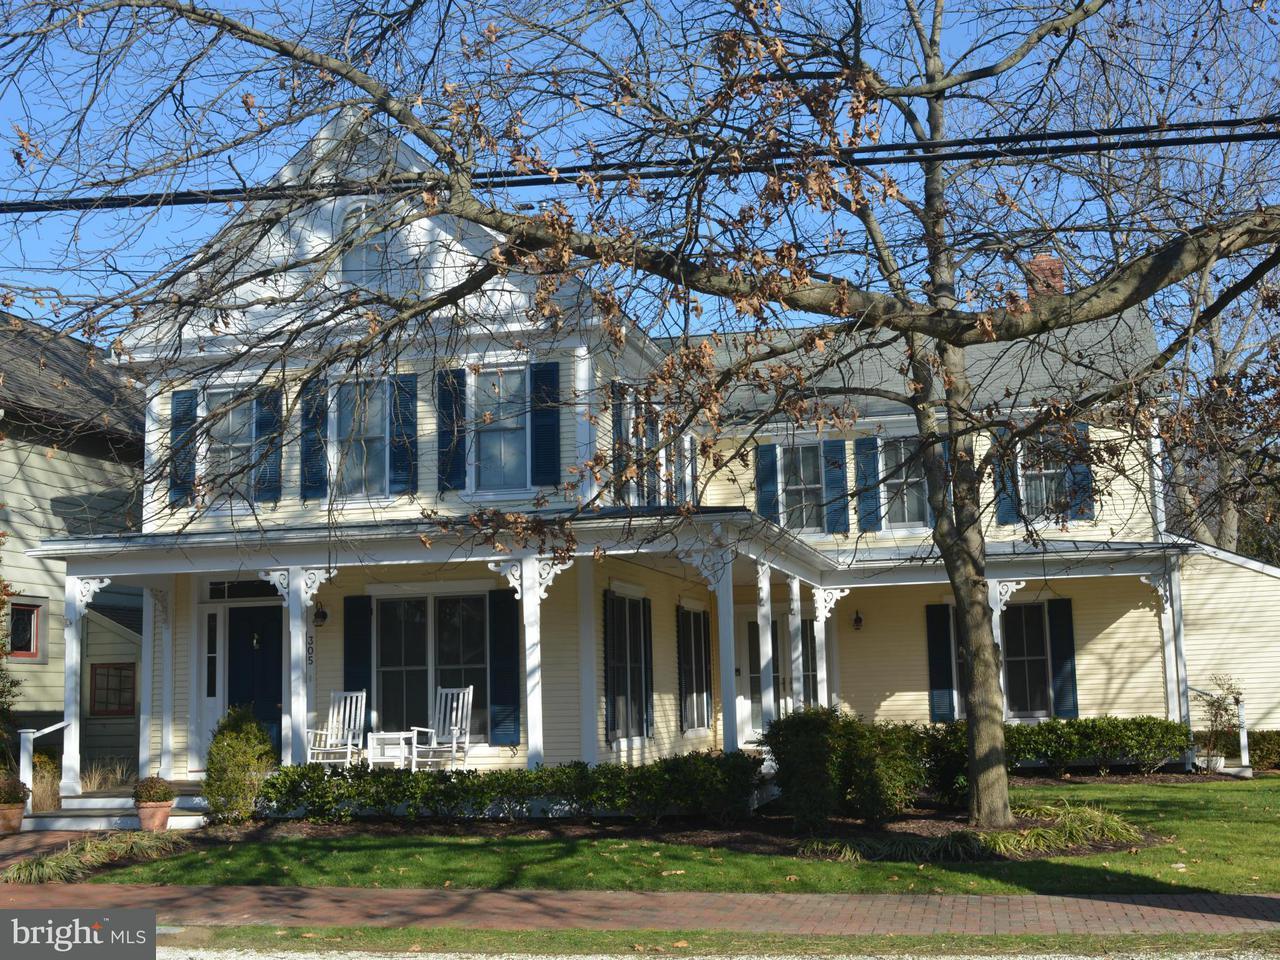 Villa per Vendita alle ore 305 MORRIS ST S 305 MORRIS ST S Oxford, Maryland 21654 Stati Uniti